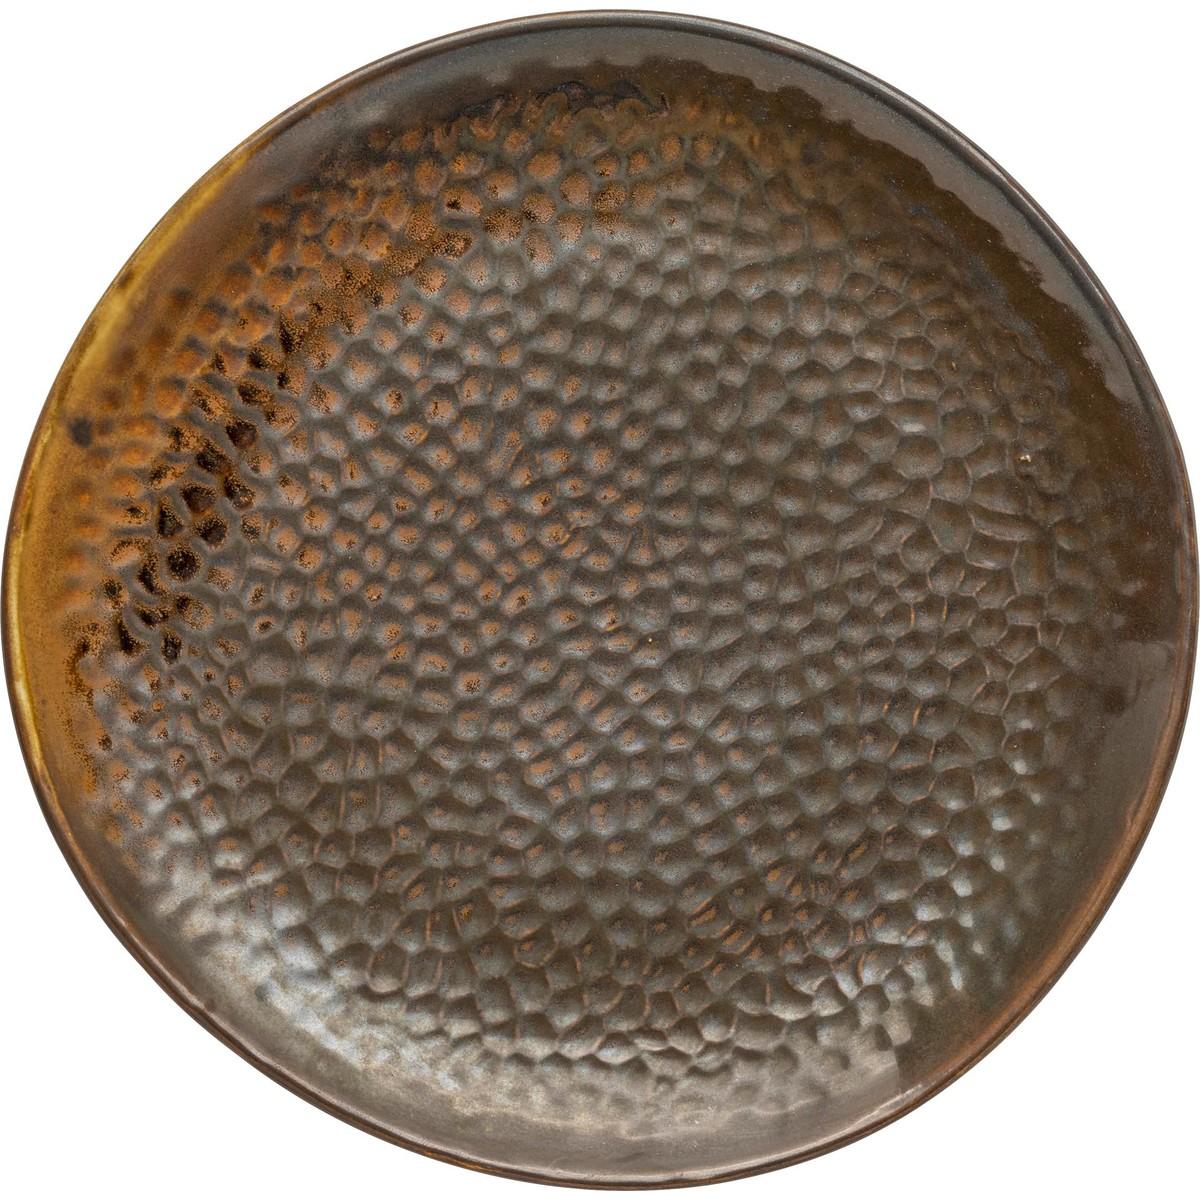 "Porzellanserie ""Rusty"" Teller flach Ø20,3cm"